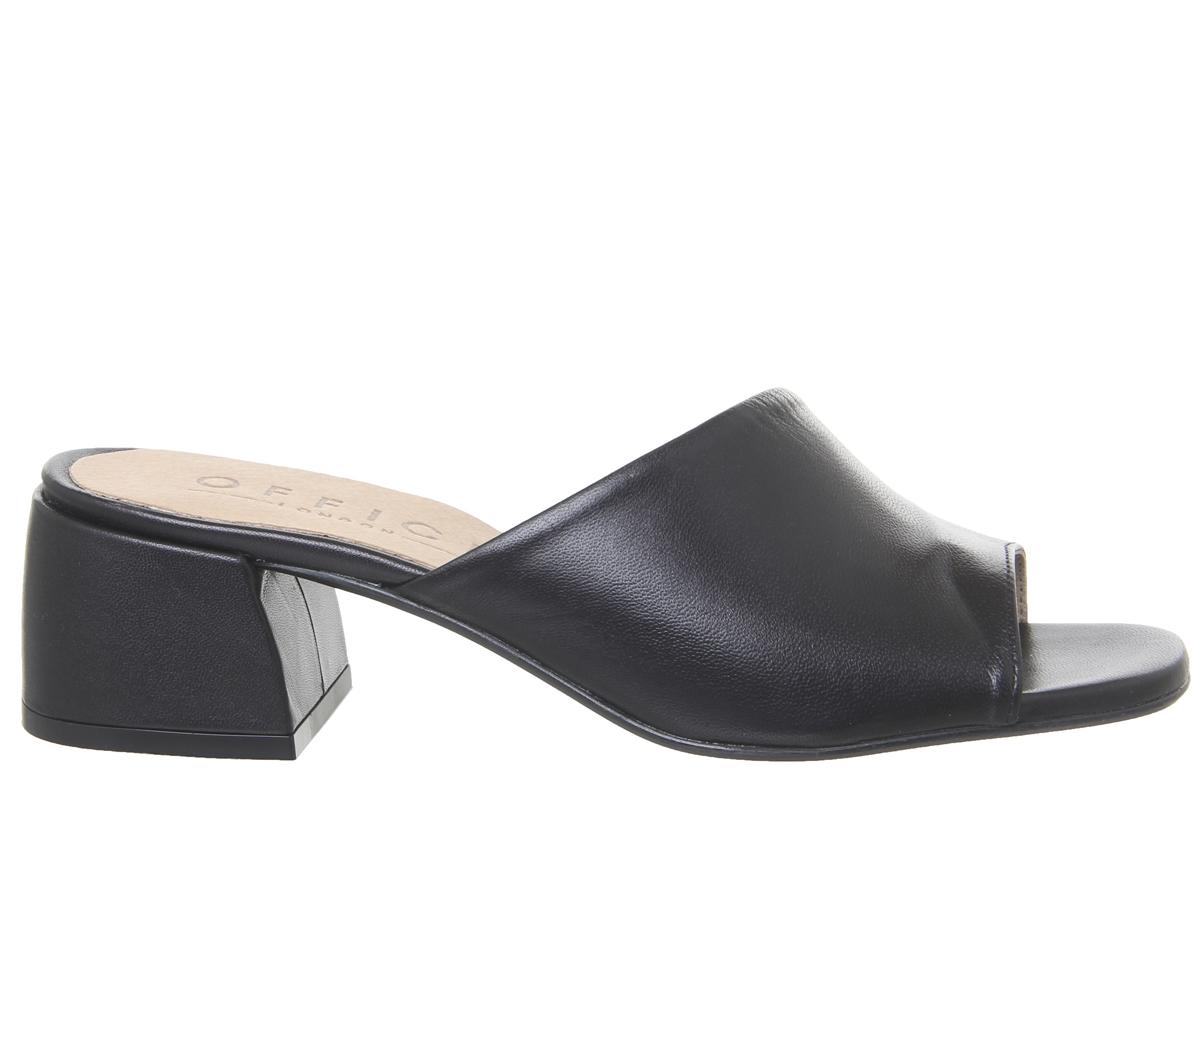 Womens Office Millionth Asymmetric Mules Black Leather Heels